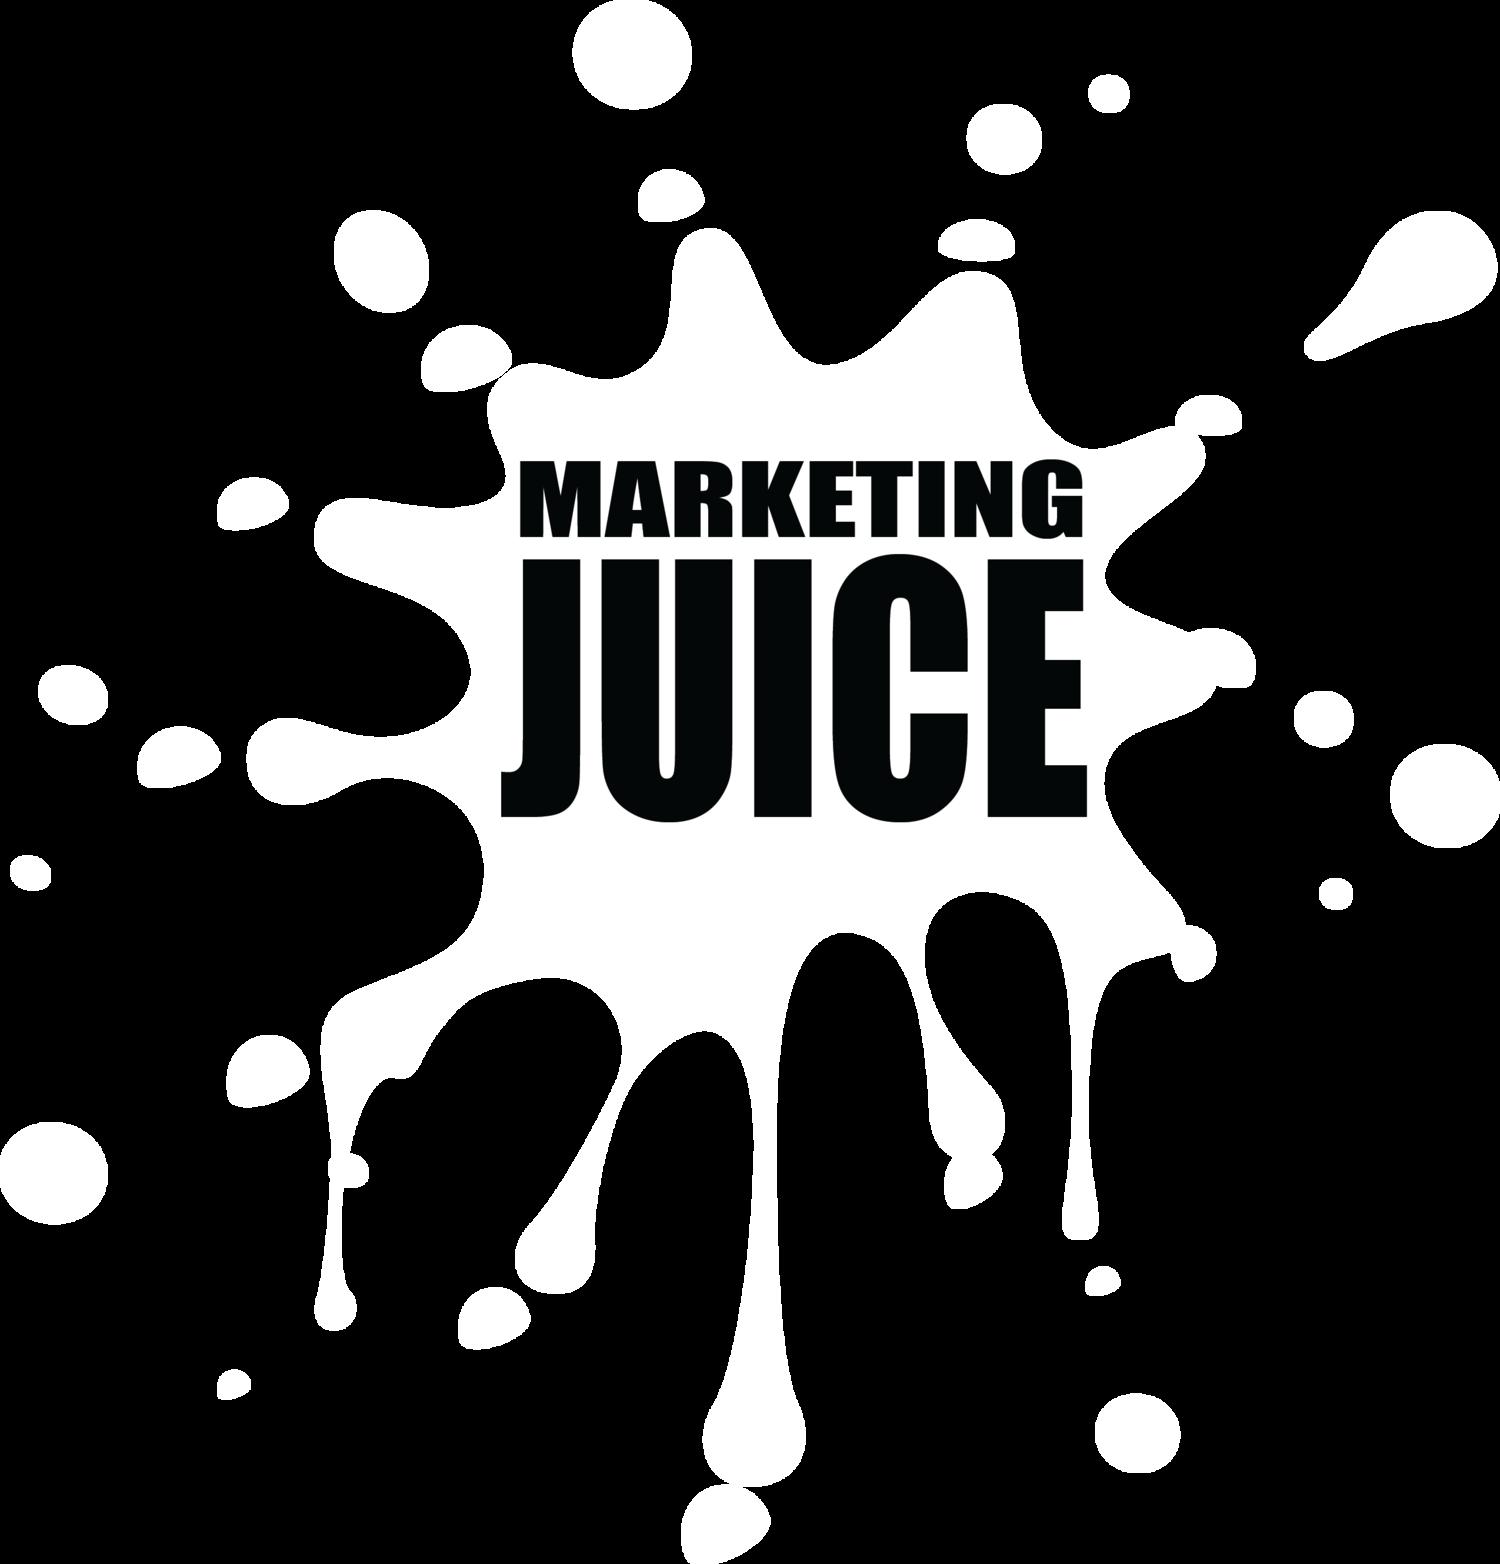 Free Social Media Marketing Class Facebook Business Manager Refresh Marketing Juice